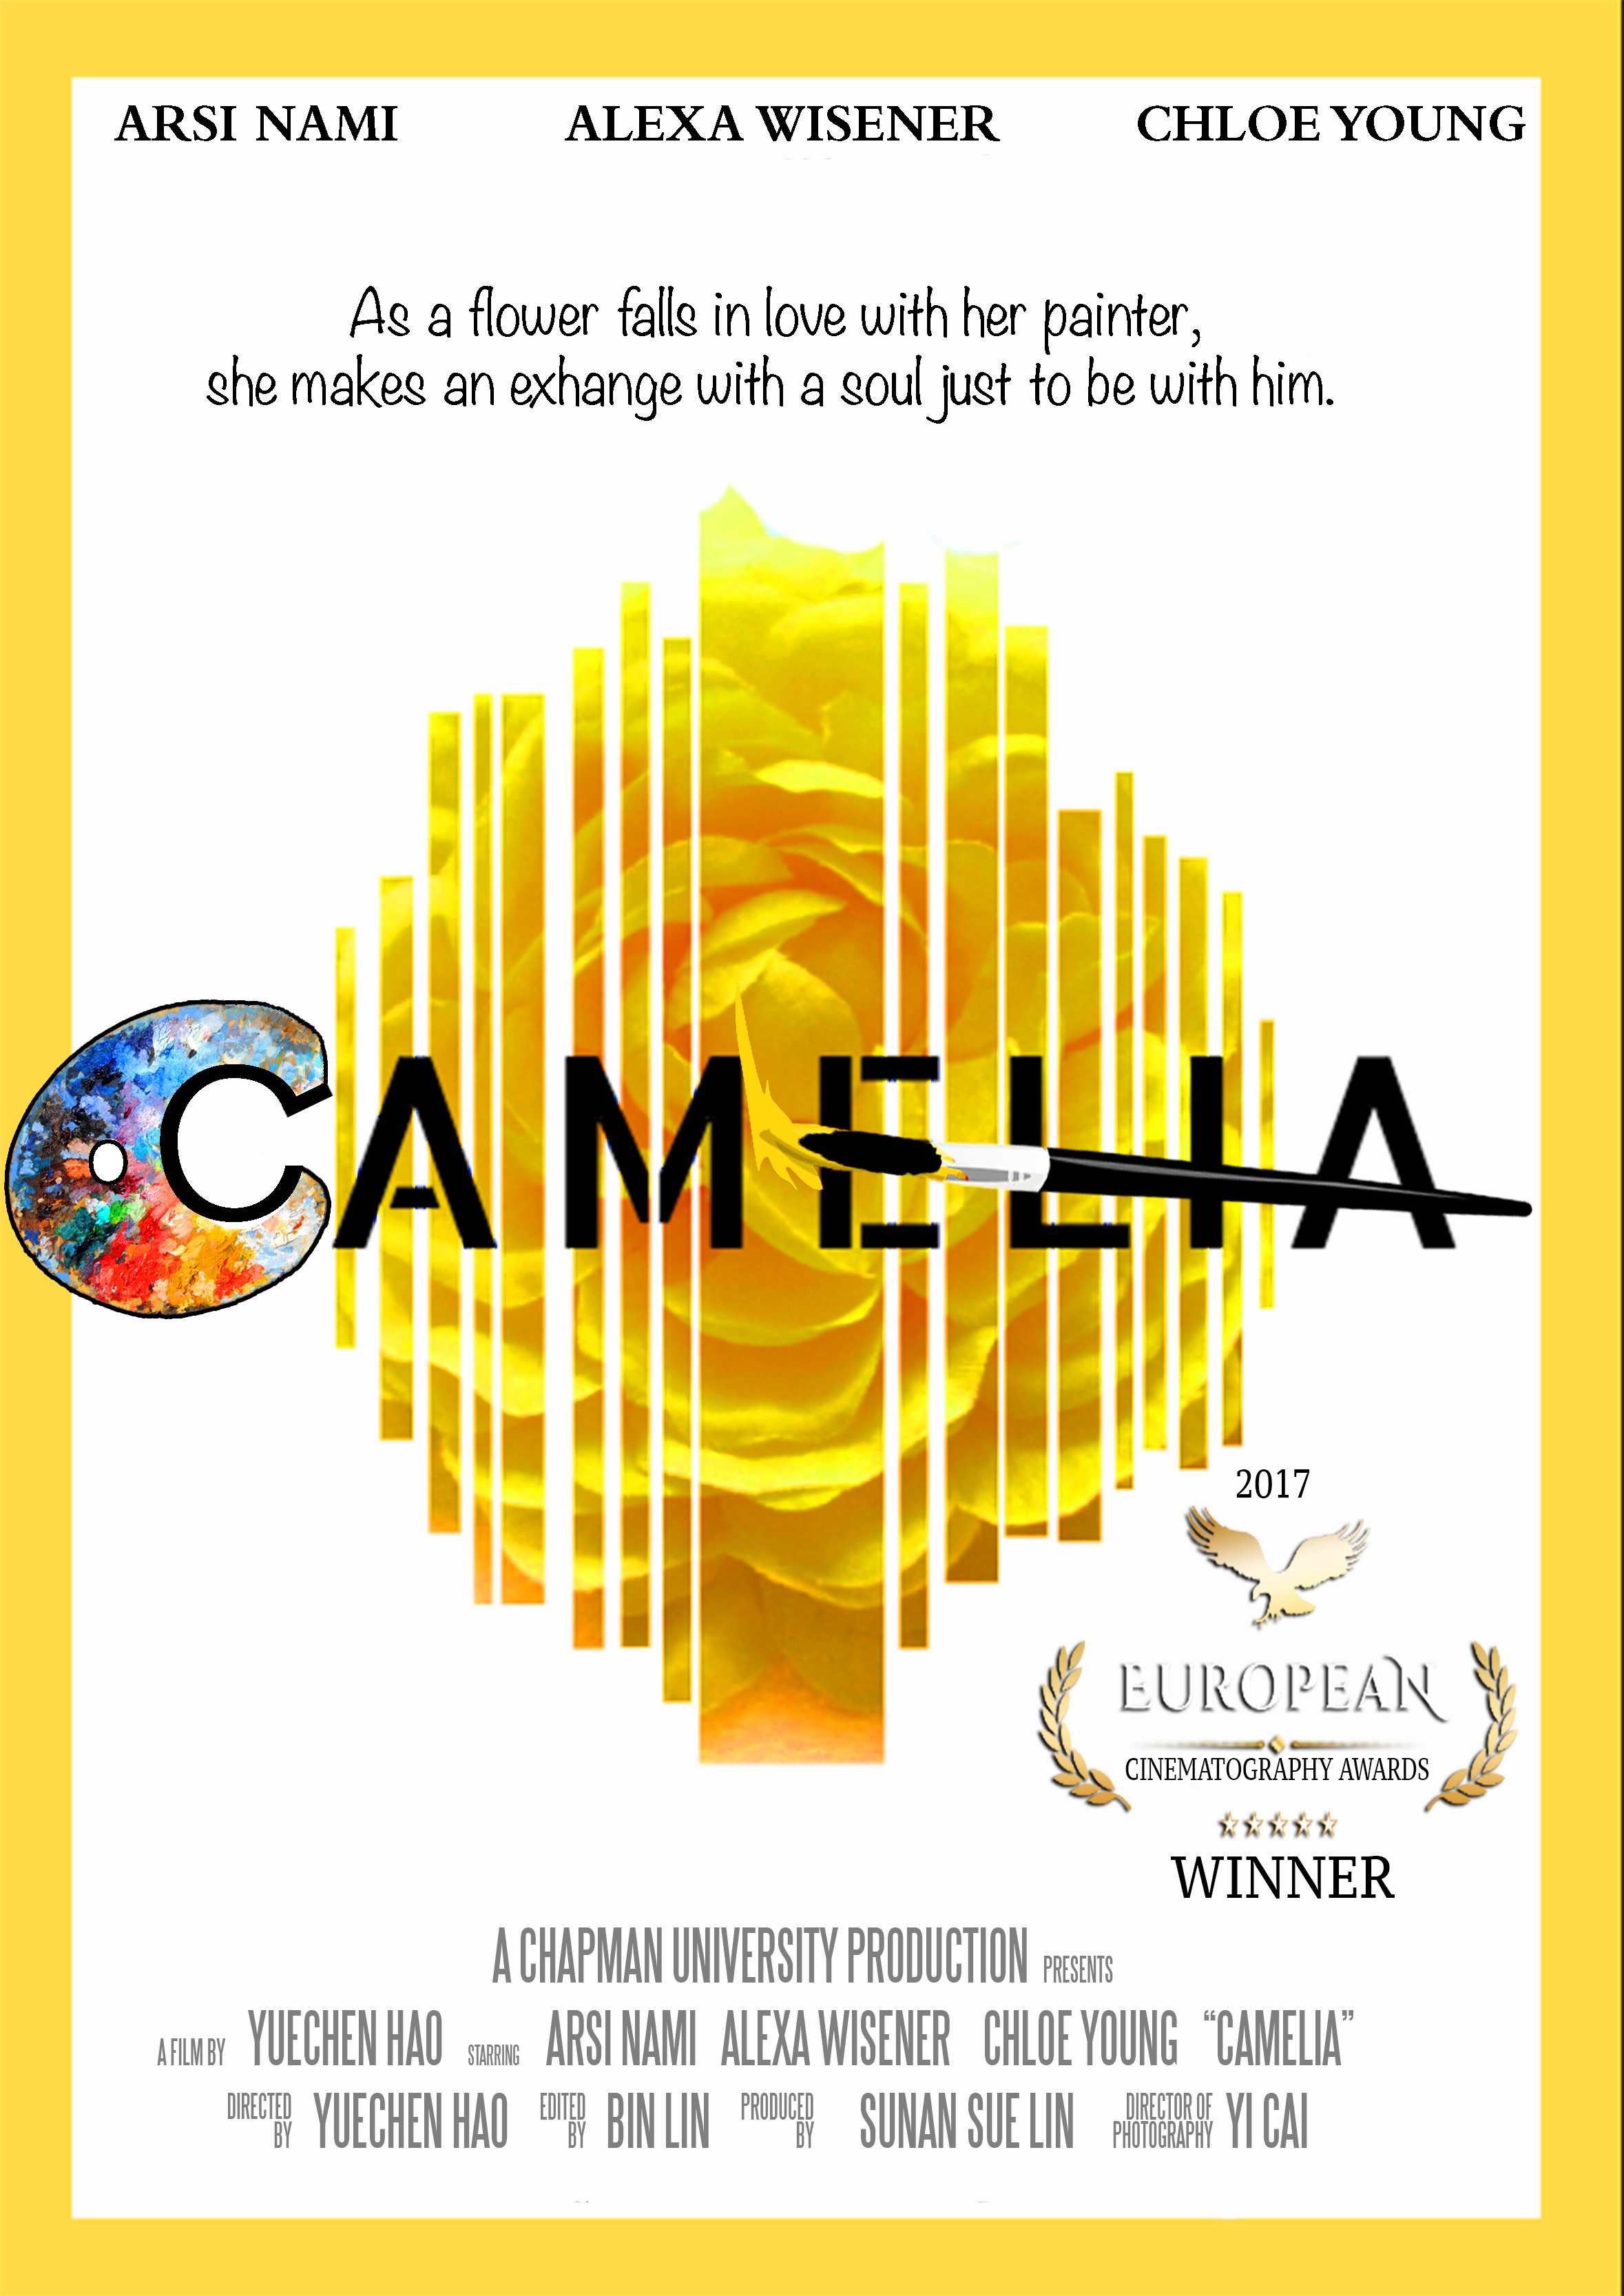 Camelia (2017) Arsi Nami